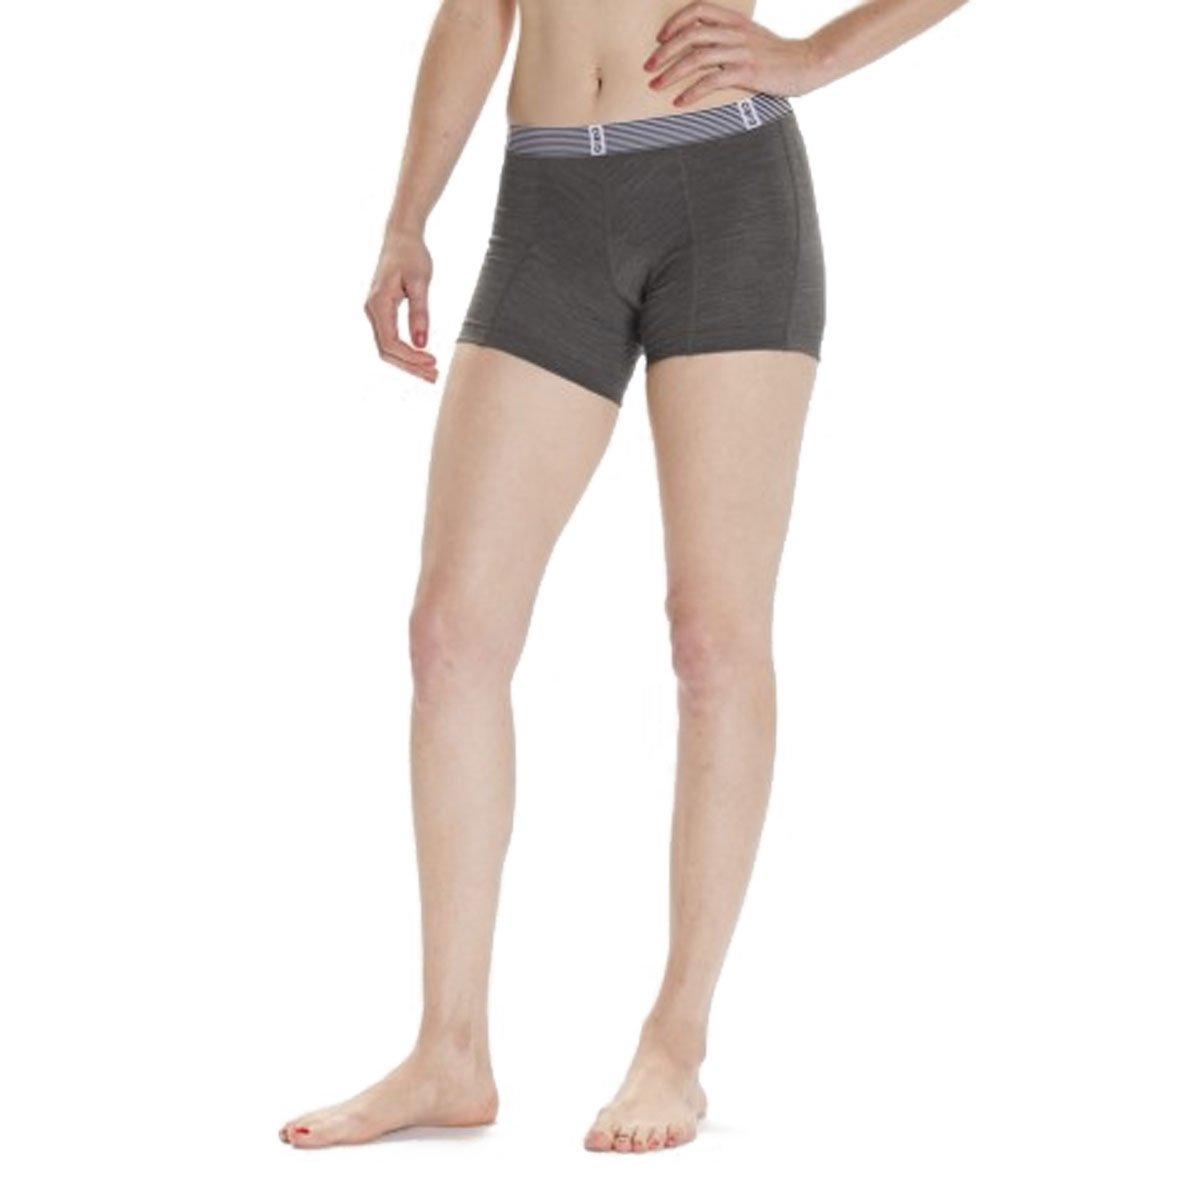 Giro Mtb Girls Shorts Boy - Undershort Dark Shadow (Small , Grau)